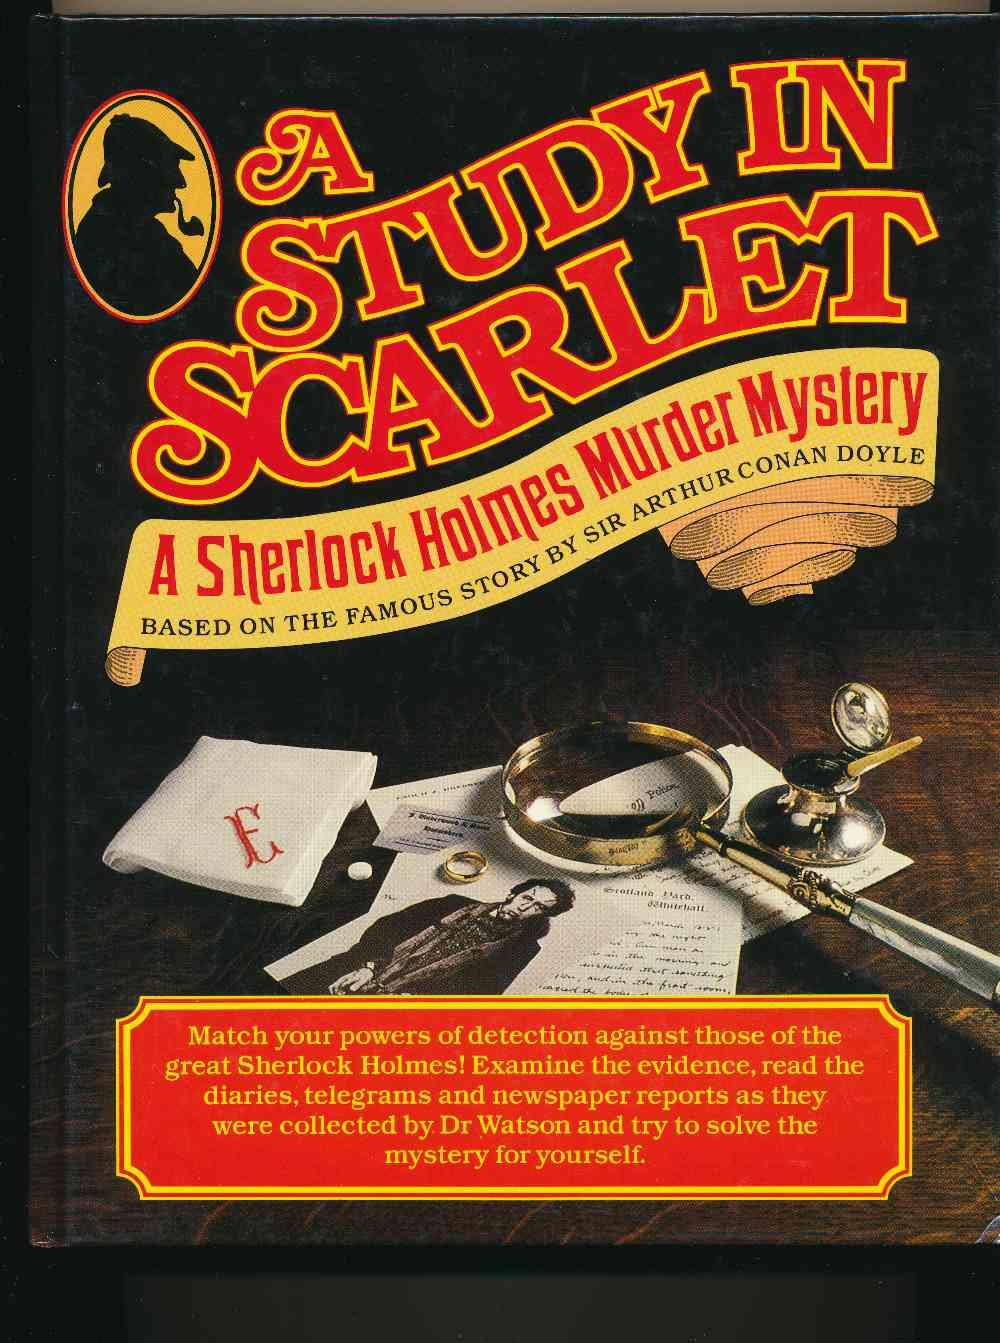 A study in scarlet : a Sherlock Holmes murder mystery